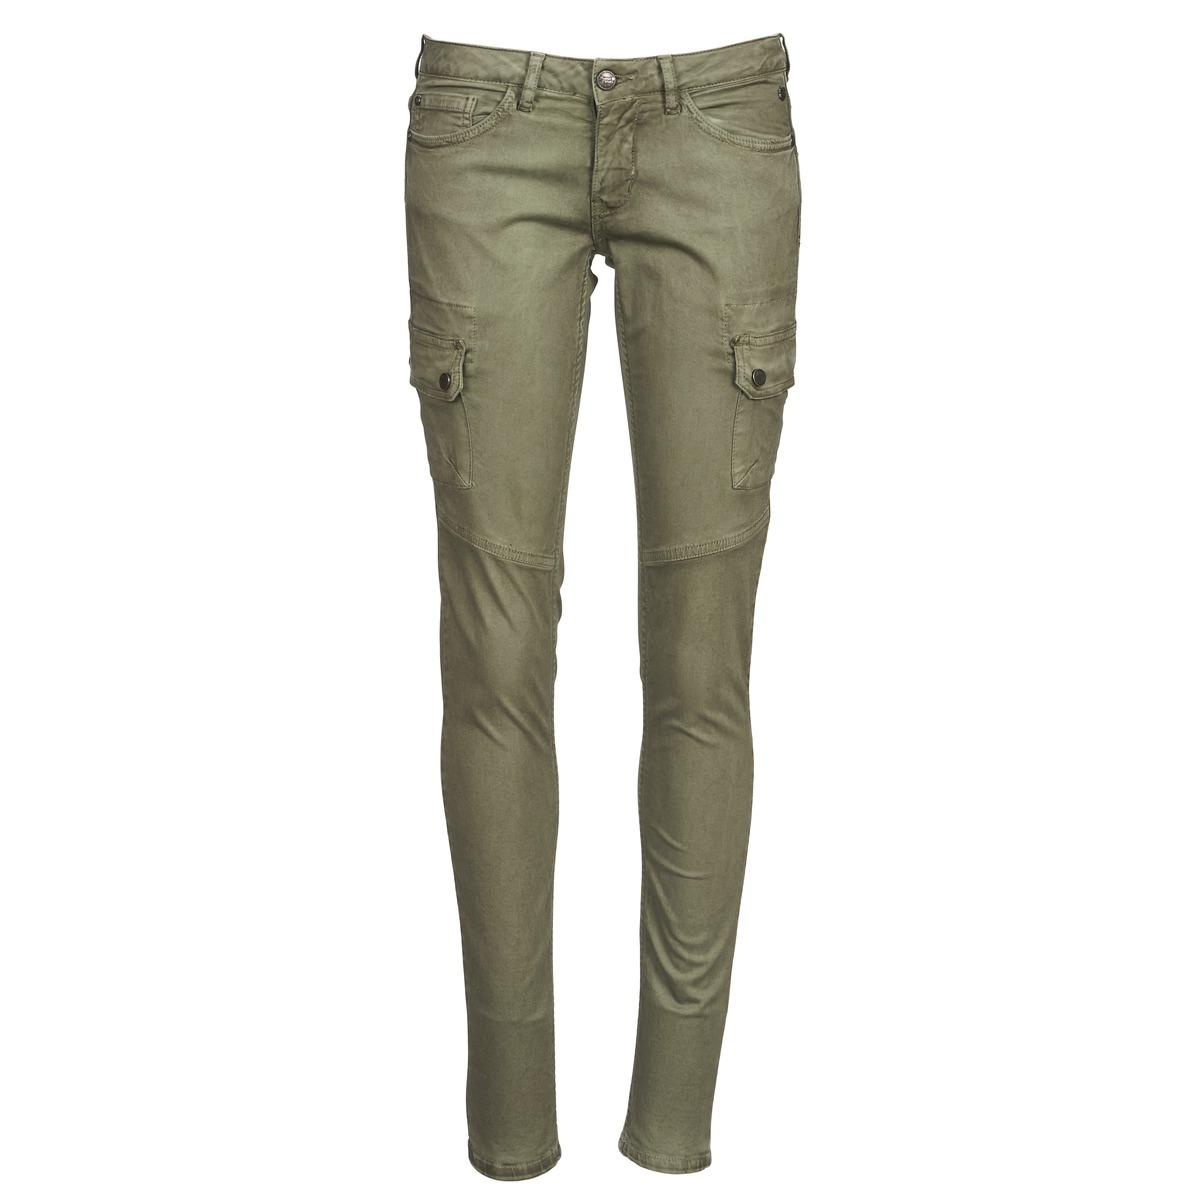 pantalon 5 poches freeman t porter paulyne kaki pantalon femme spartoo ventes pas. Black Bedroom Furniture Sets. Home Design Ideas